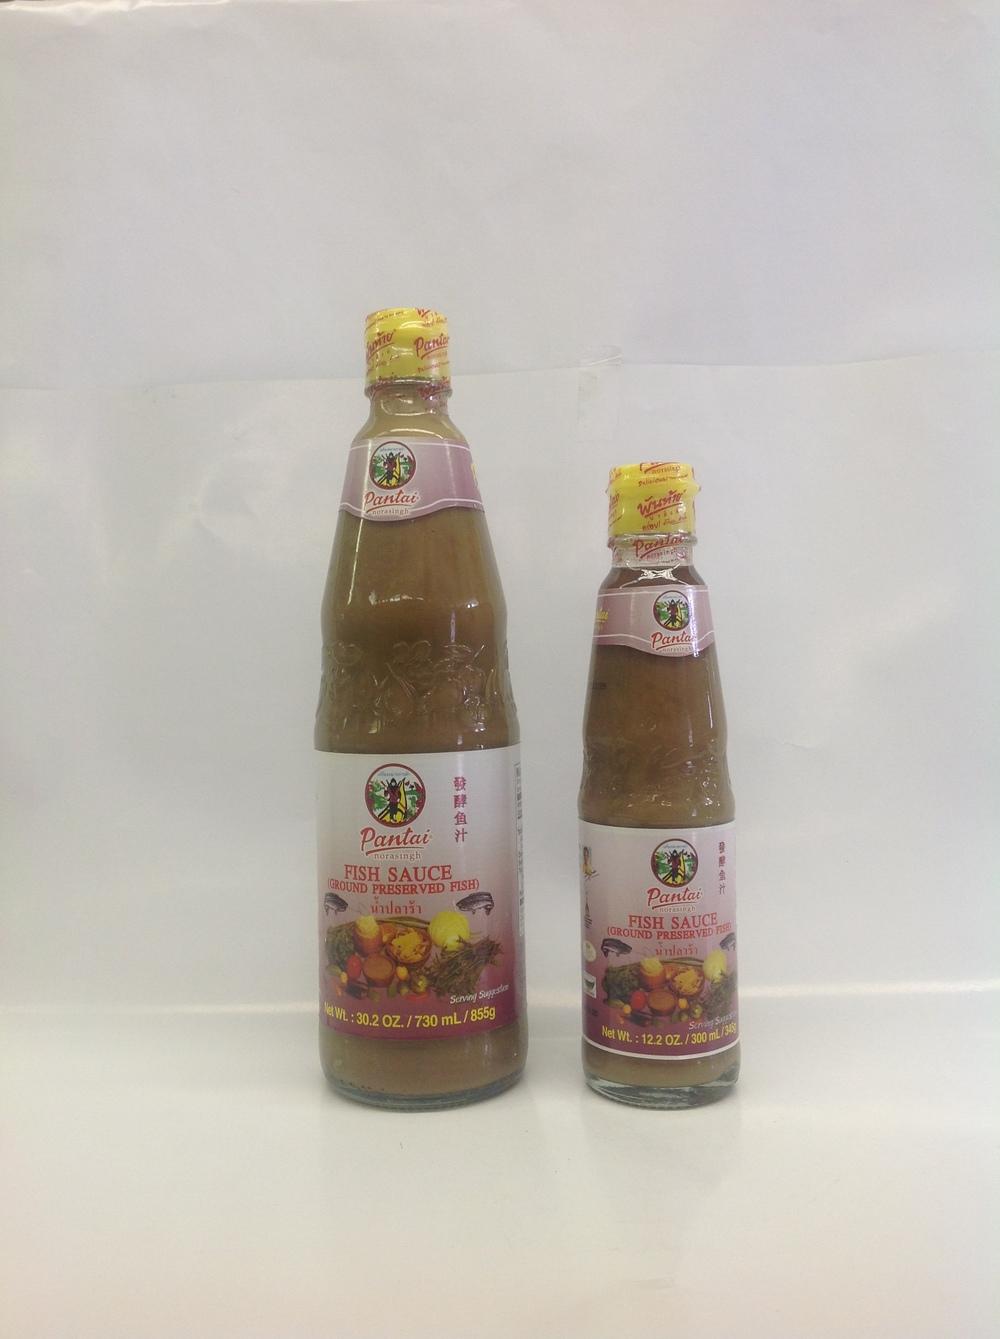 Mam Nem Fish Sauce   Pantai   SA15107 24x12.2 oz  SA15110 12x30.2 oz